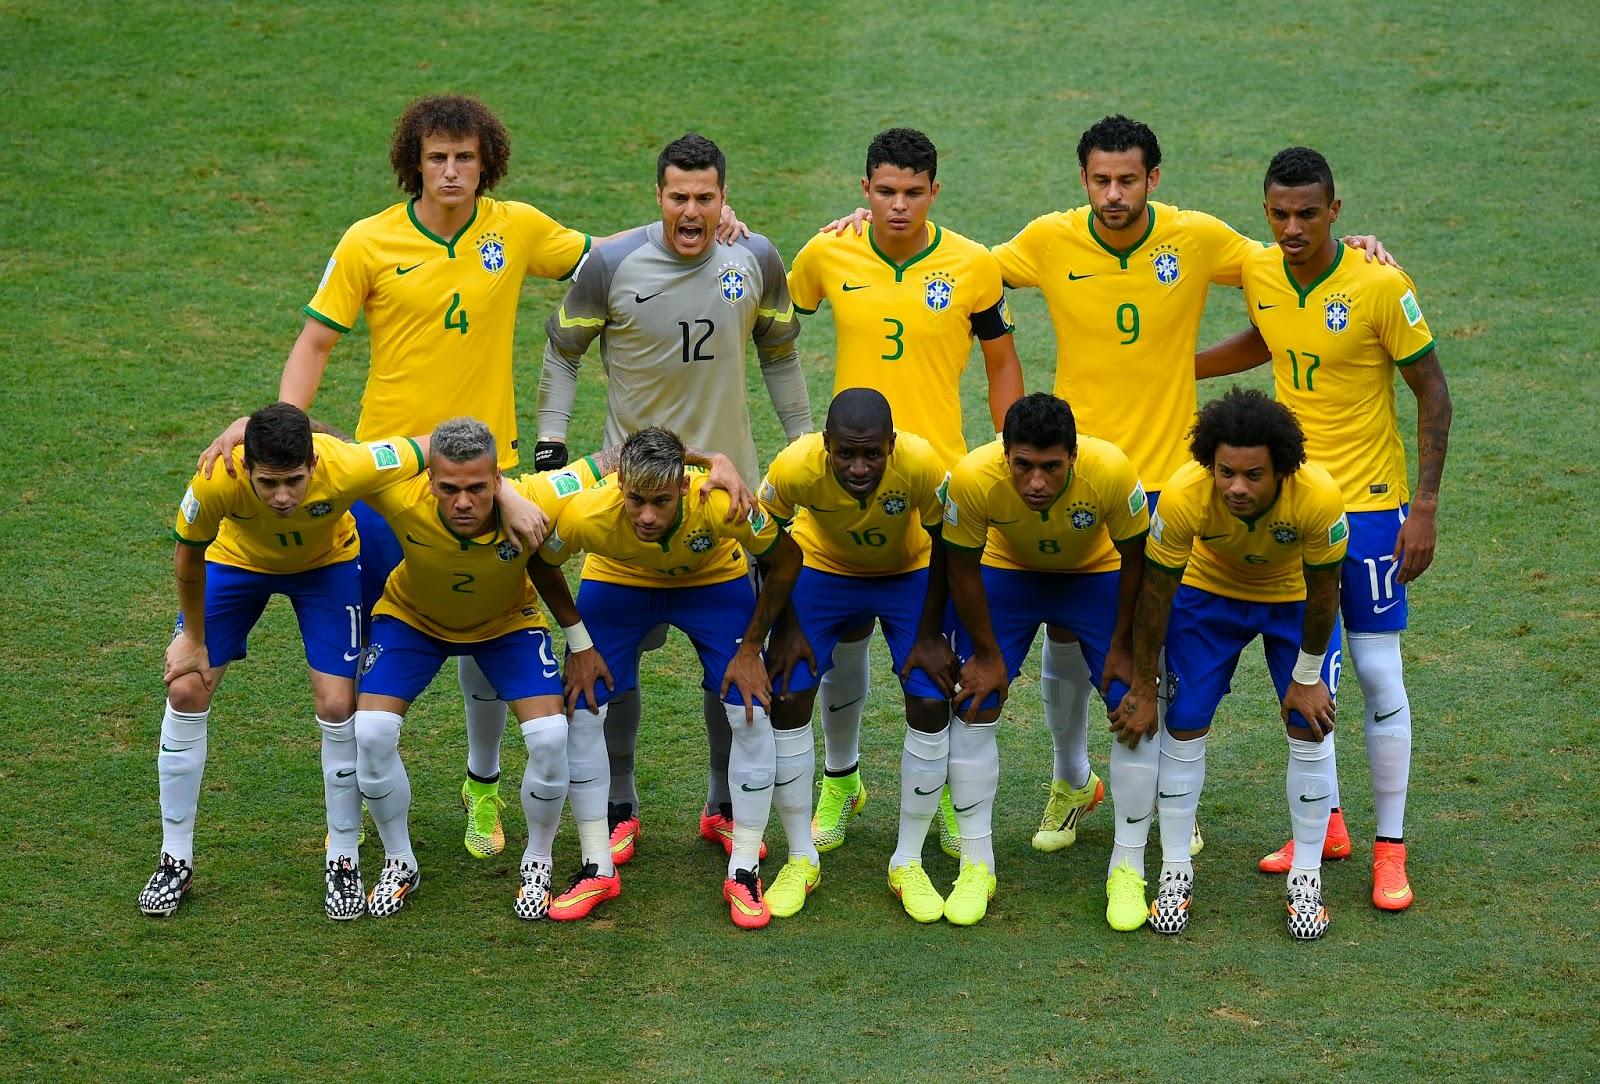 Brazil, Brazil Squad, Brazil vs Mexico, David Luiz, FIFA World Cup, FIFA World Cup 2014, Football, Fred, Group A, Hector Moreno, Luiz Felipe Scolari, Mexico Squad, Miguel Herrera, Neymar, Rafael Marquez, Sports,